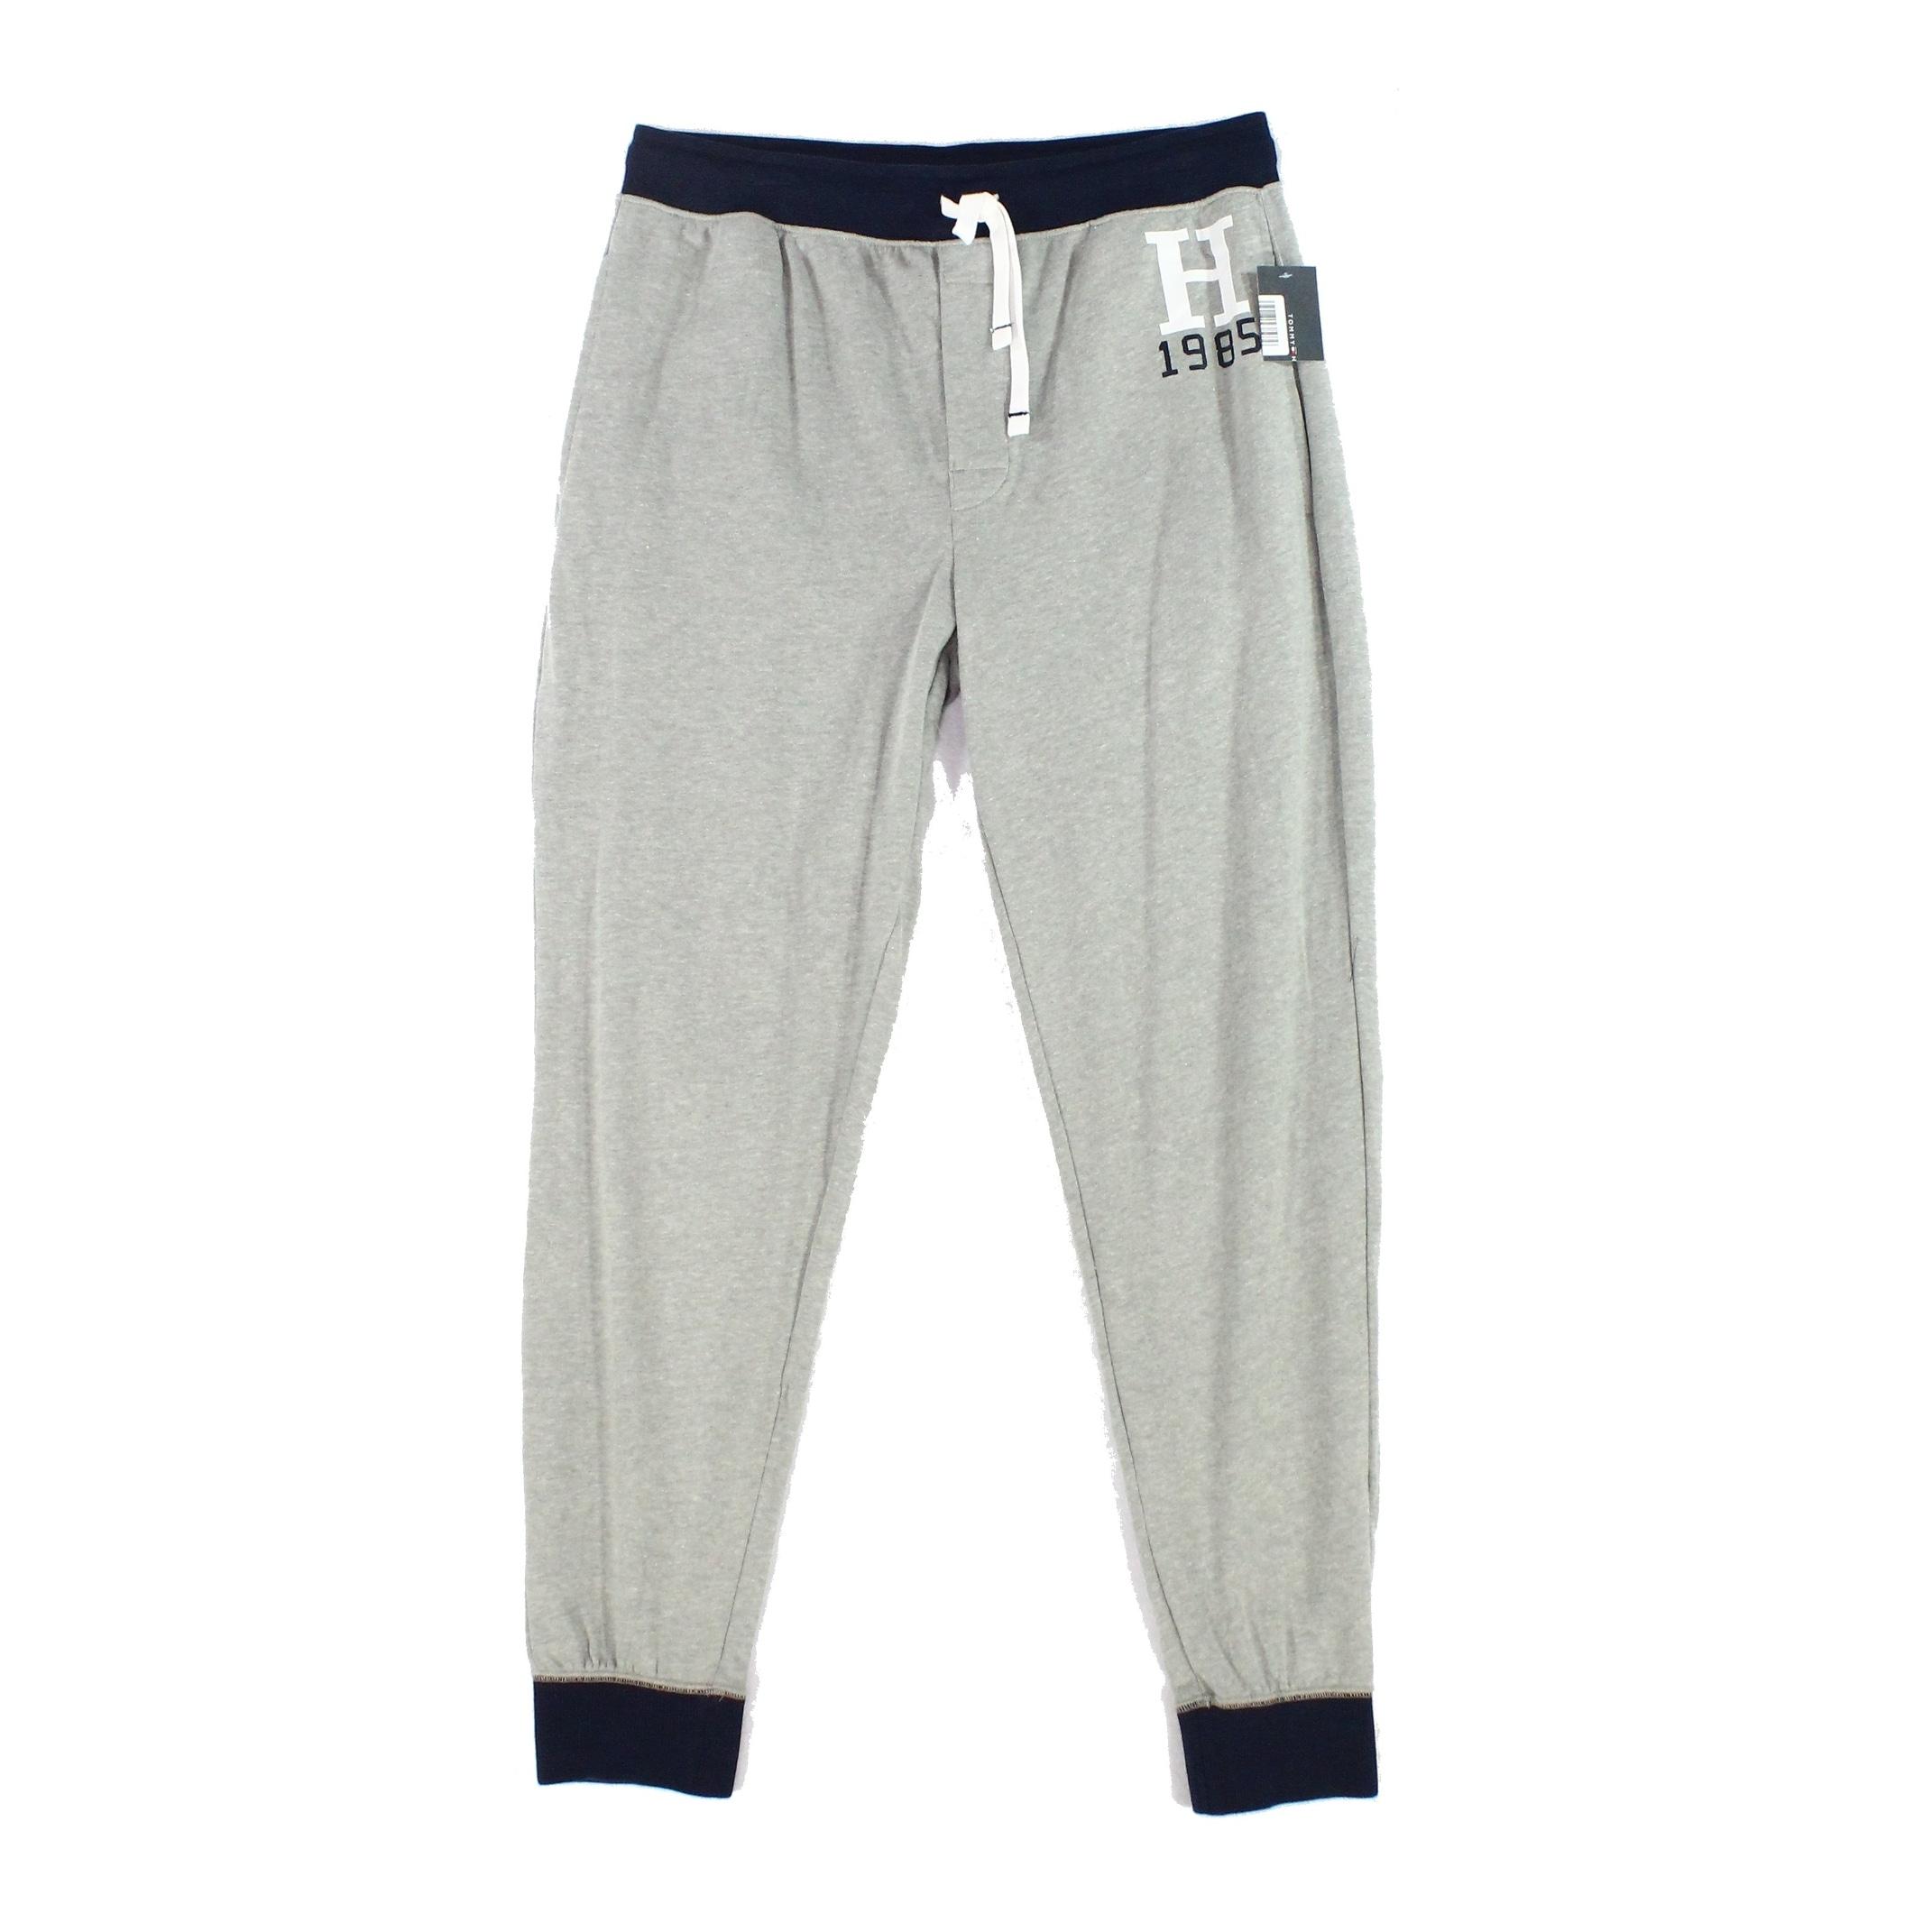 Tommy Hilfiger Mens Jersey Sleep Lounge Pant Pajama Bottom